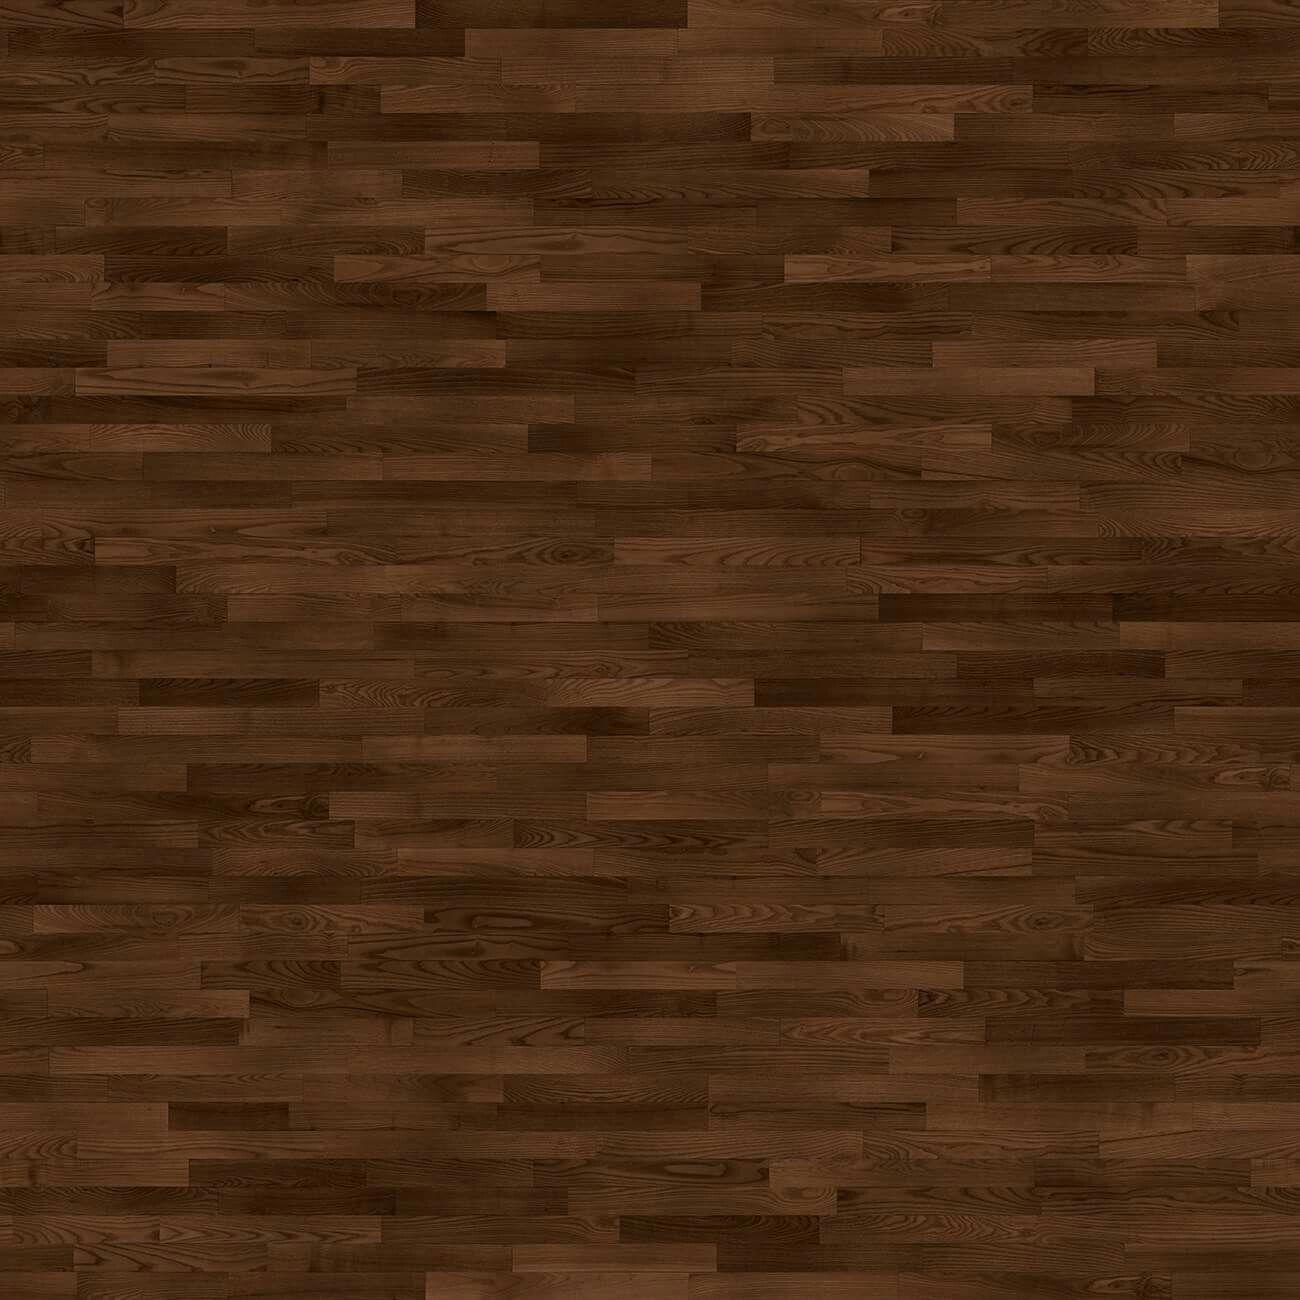 Parquet Texture Wood Flooring Floors Seamless Textures Dark Colors Diys Bricolage